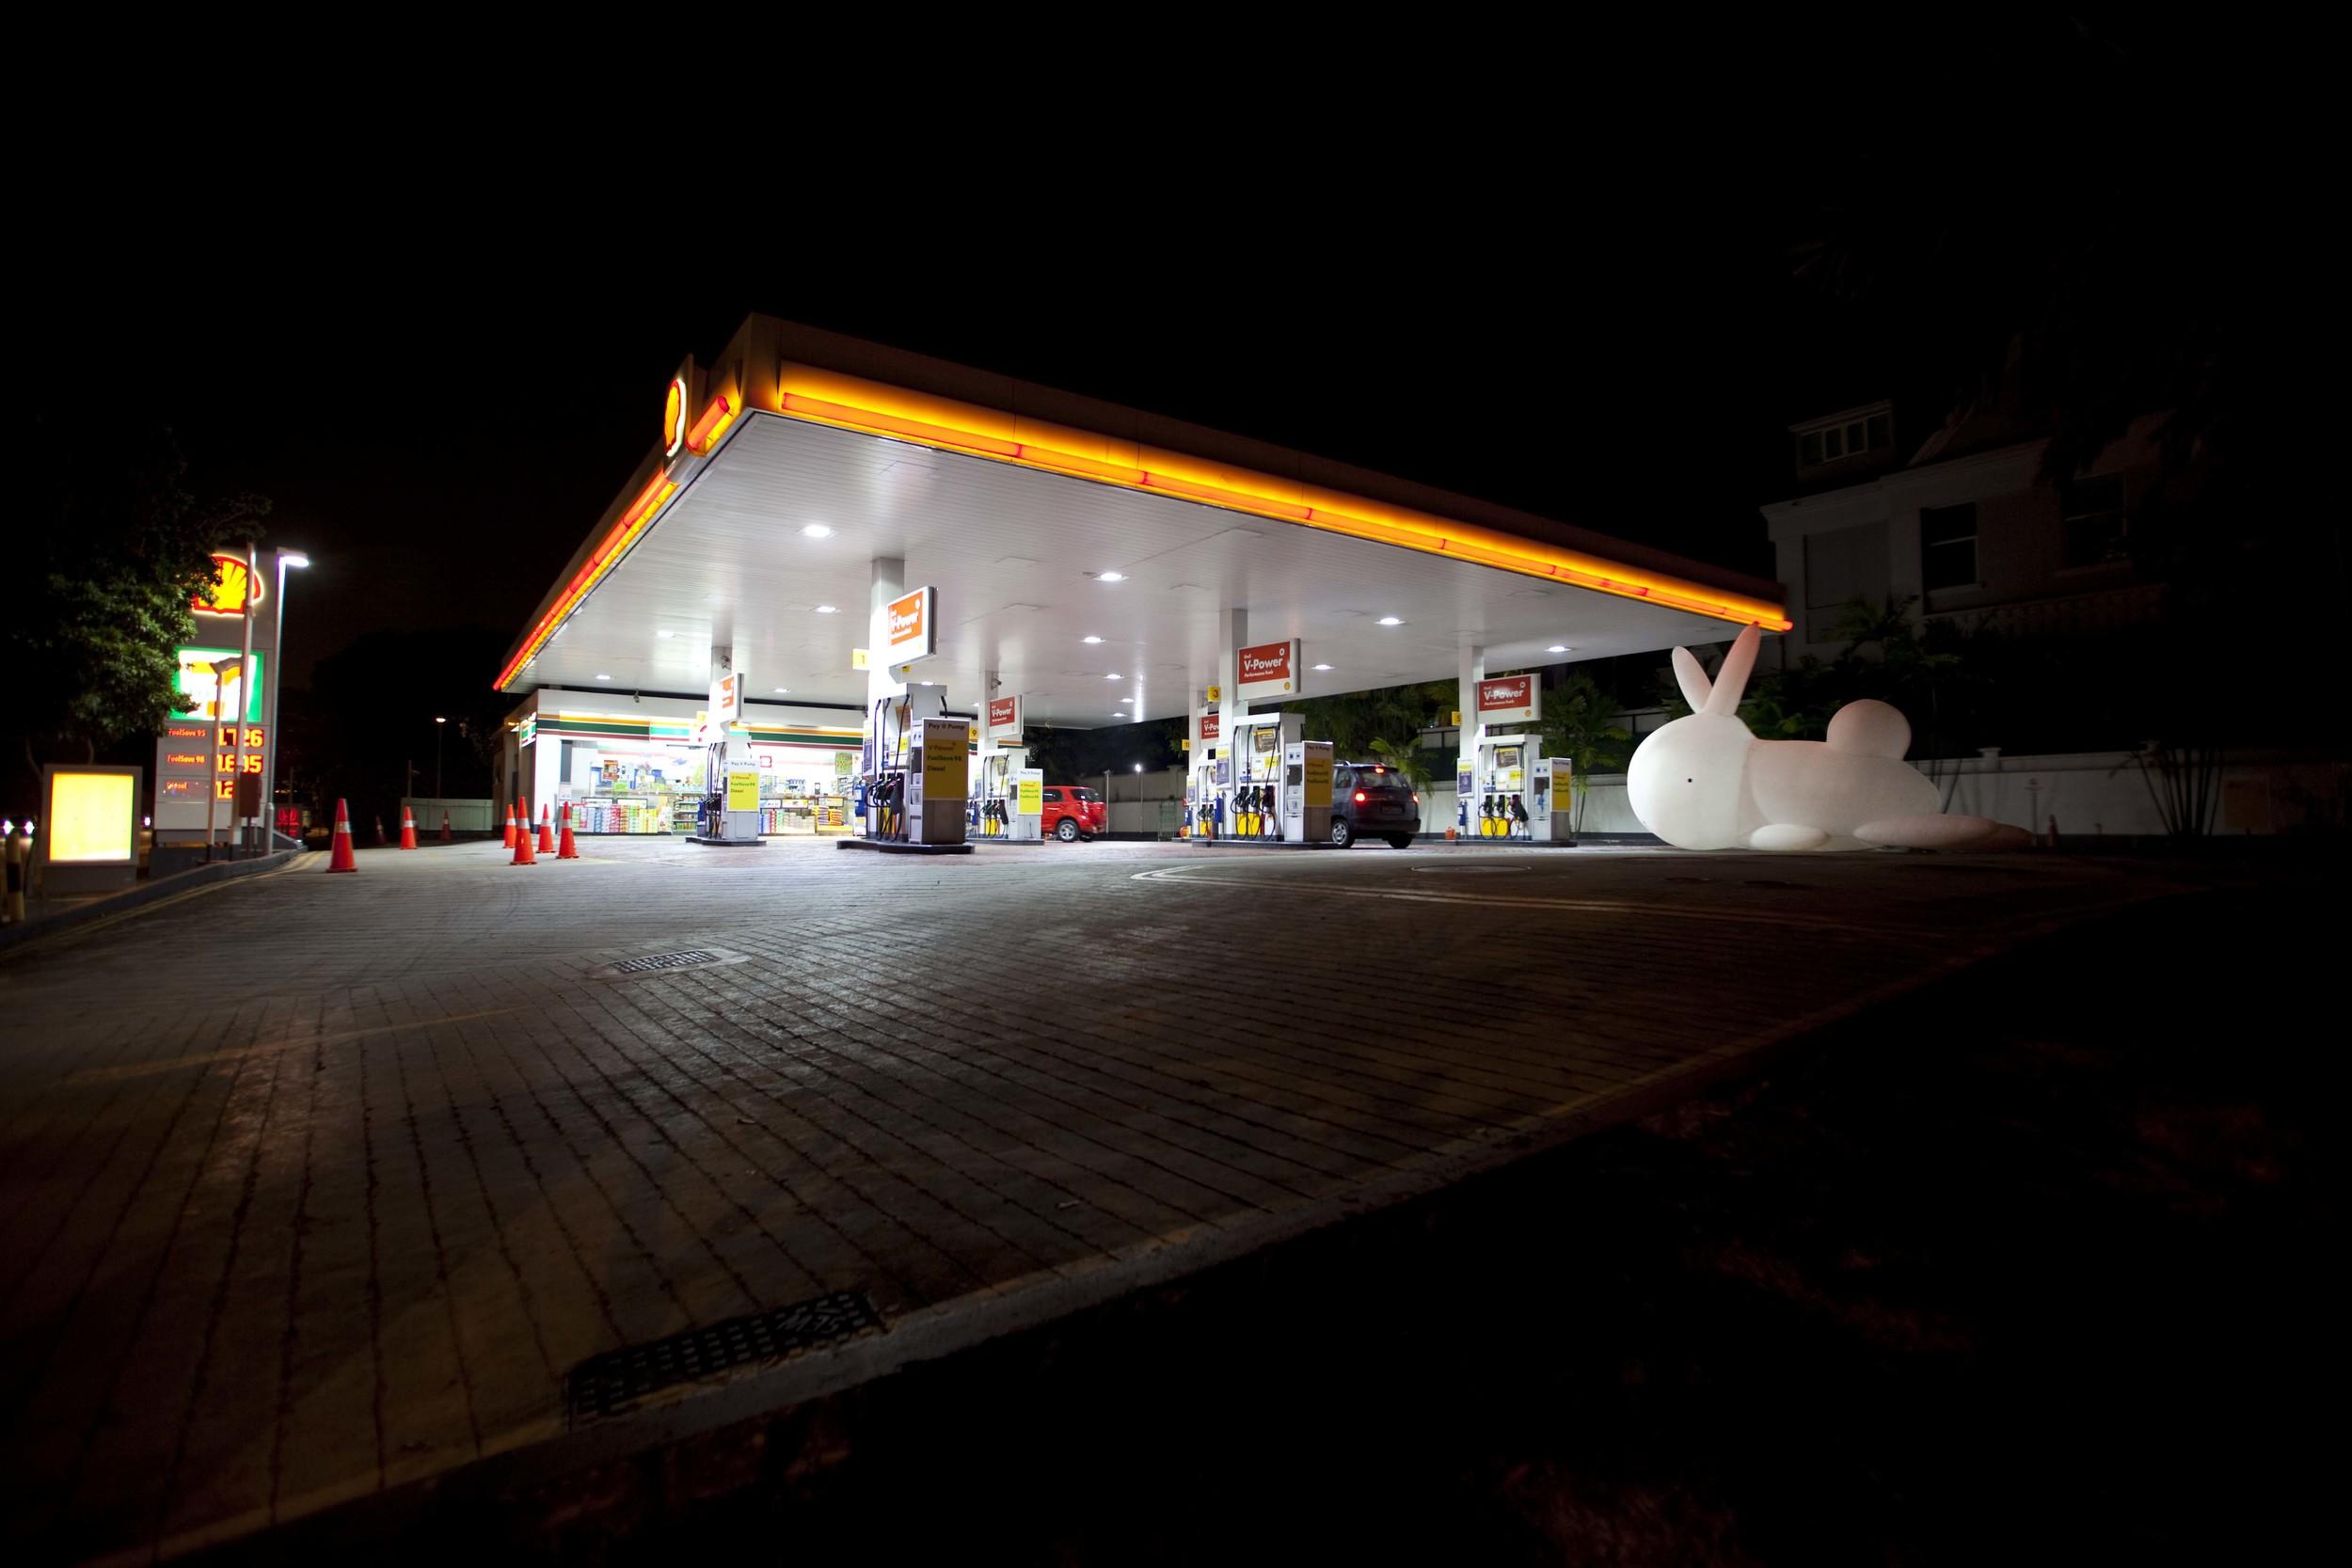 GAS, CIGARETTES AND POCKY STICKS